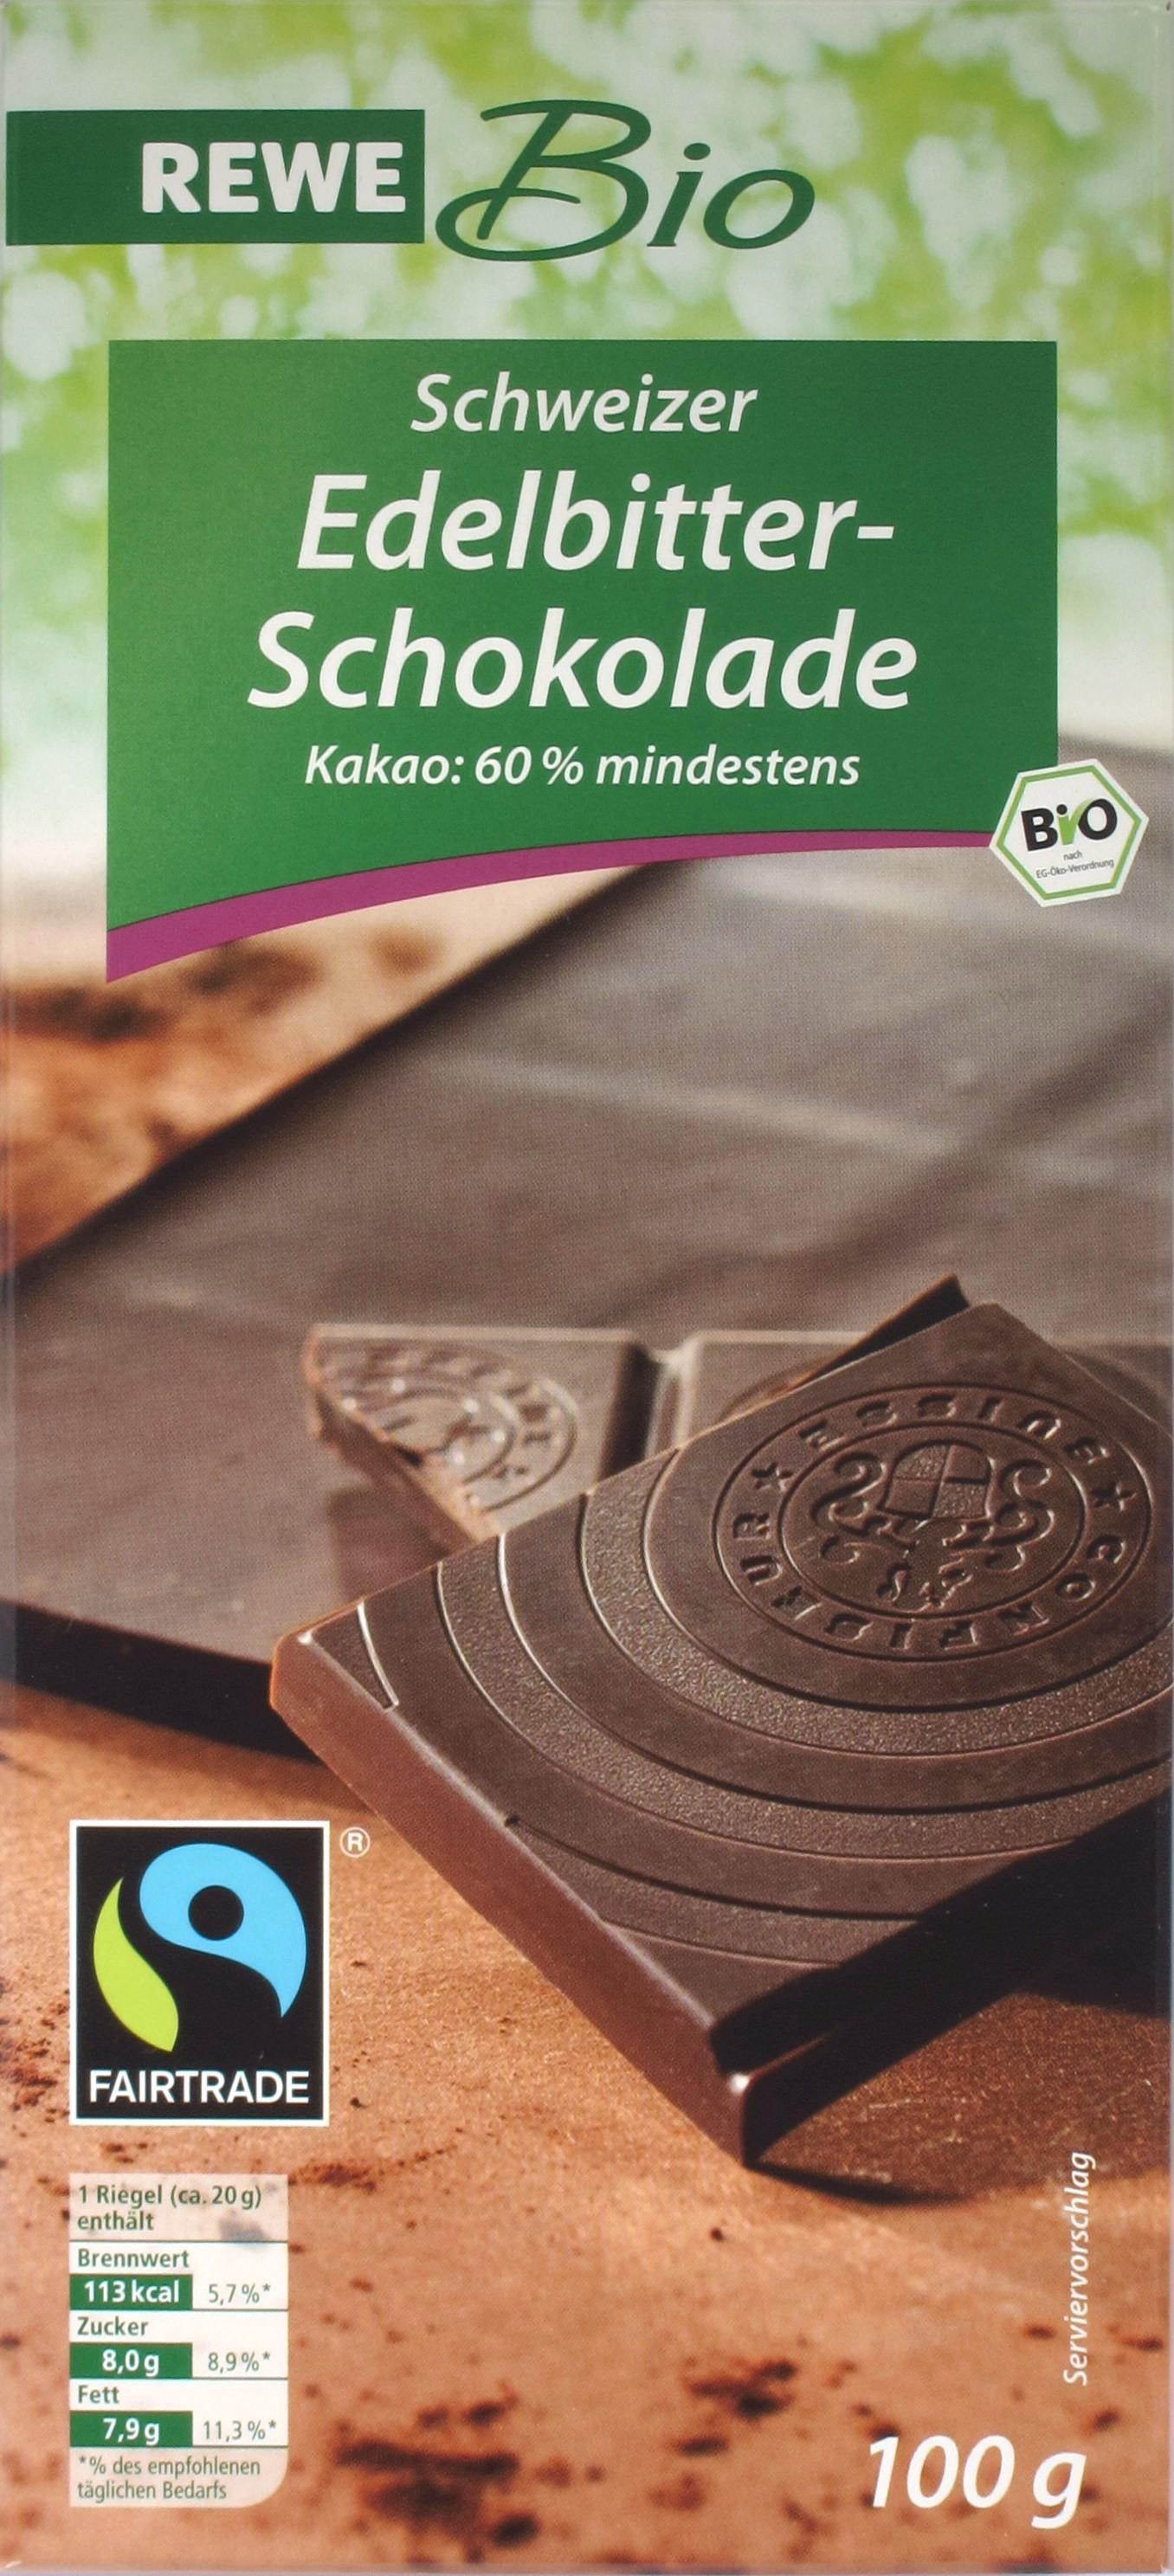 REWE Edelbitter-Schokolade, 60%, Fairtrade, Bio